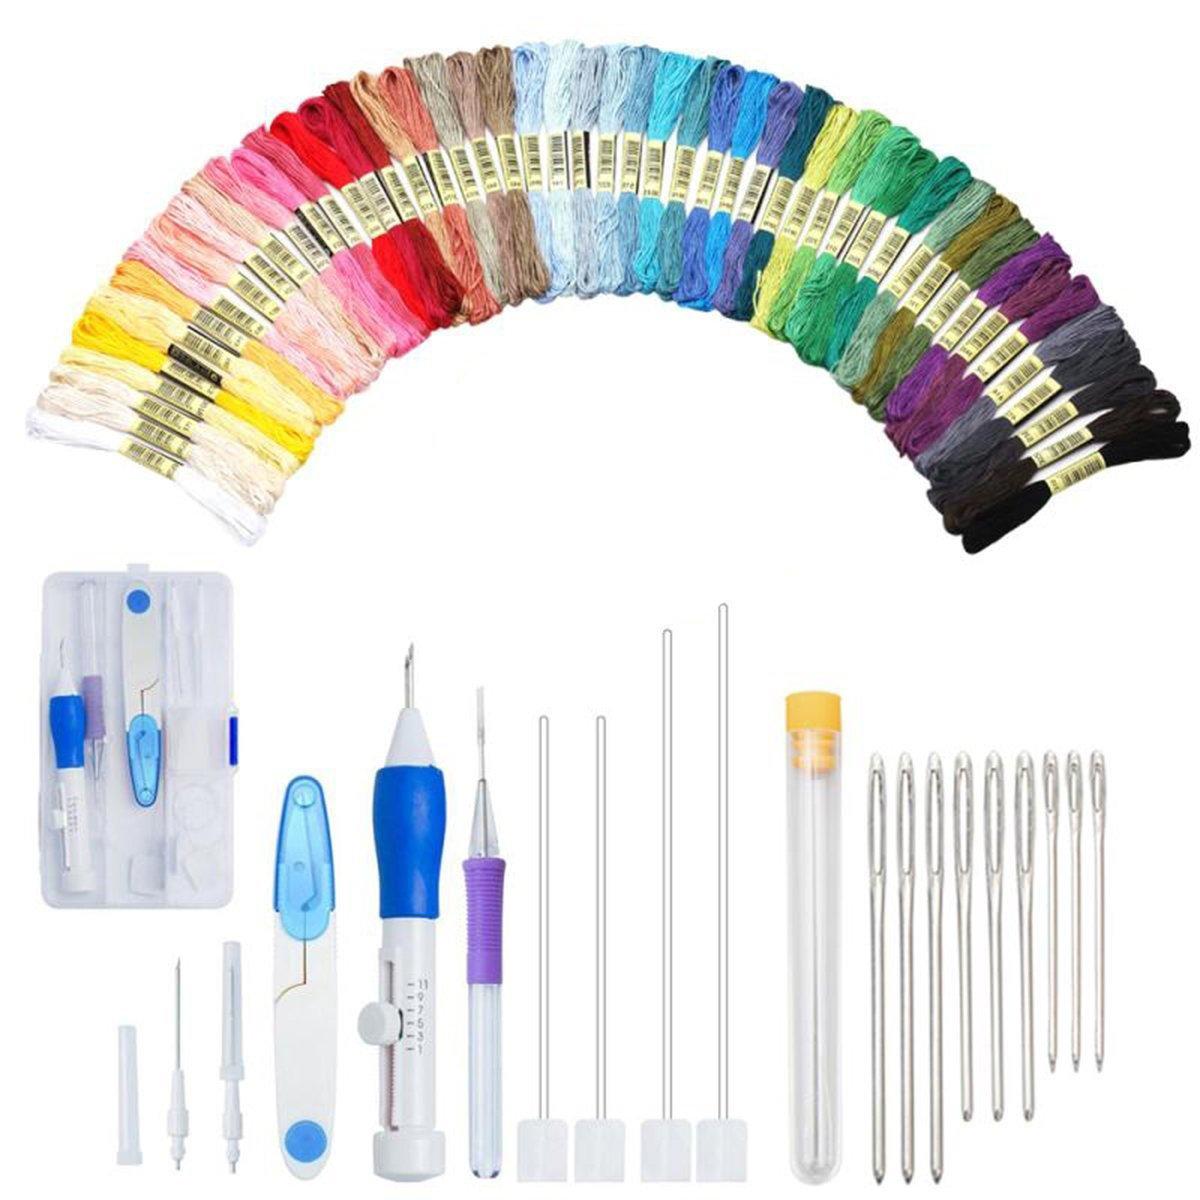 Magic Diy Embroidery Pen Set Knitting Sewing Tool Kit Punch Needle Adjustable